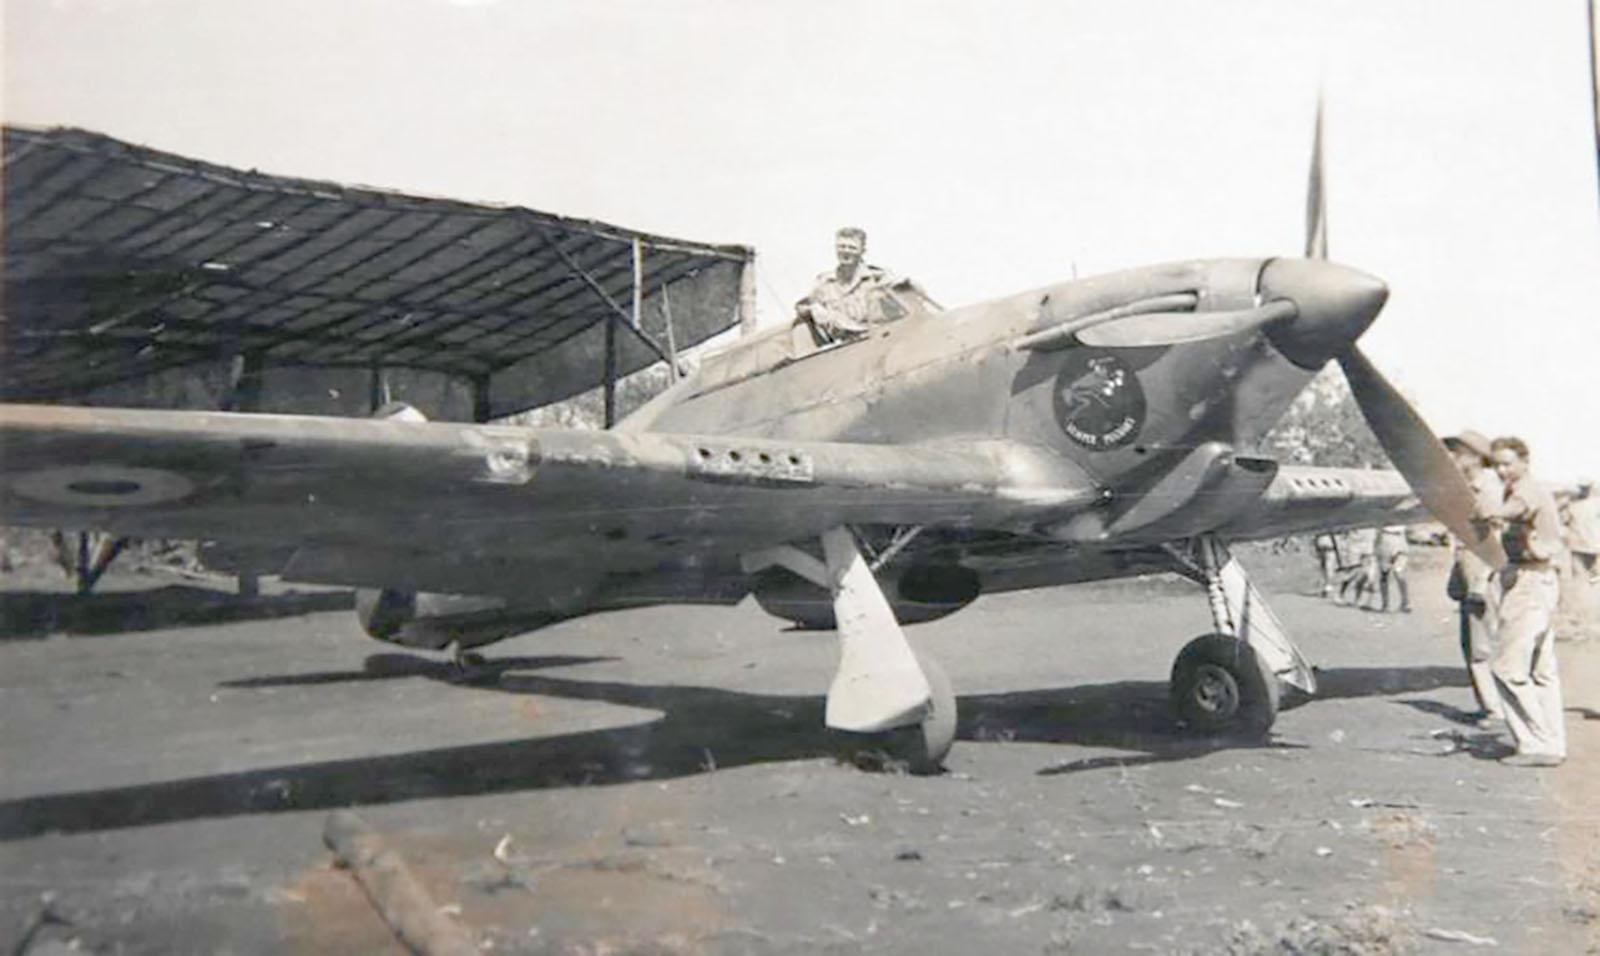 Hurricane I Trop SAAF 3Sqn J Bob Kershaw 284 Dagahbur Ethiopia East Africa March 1941 02